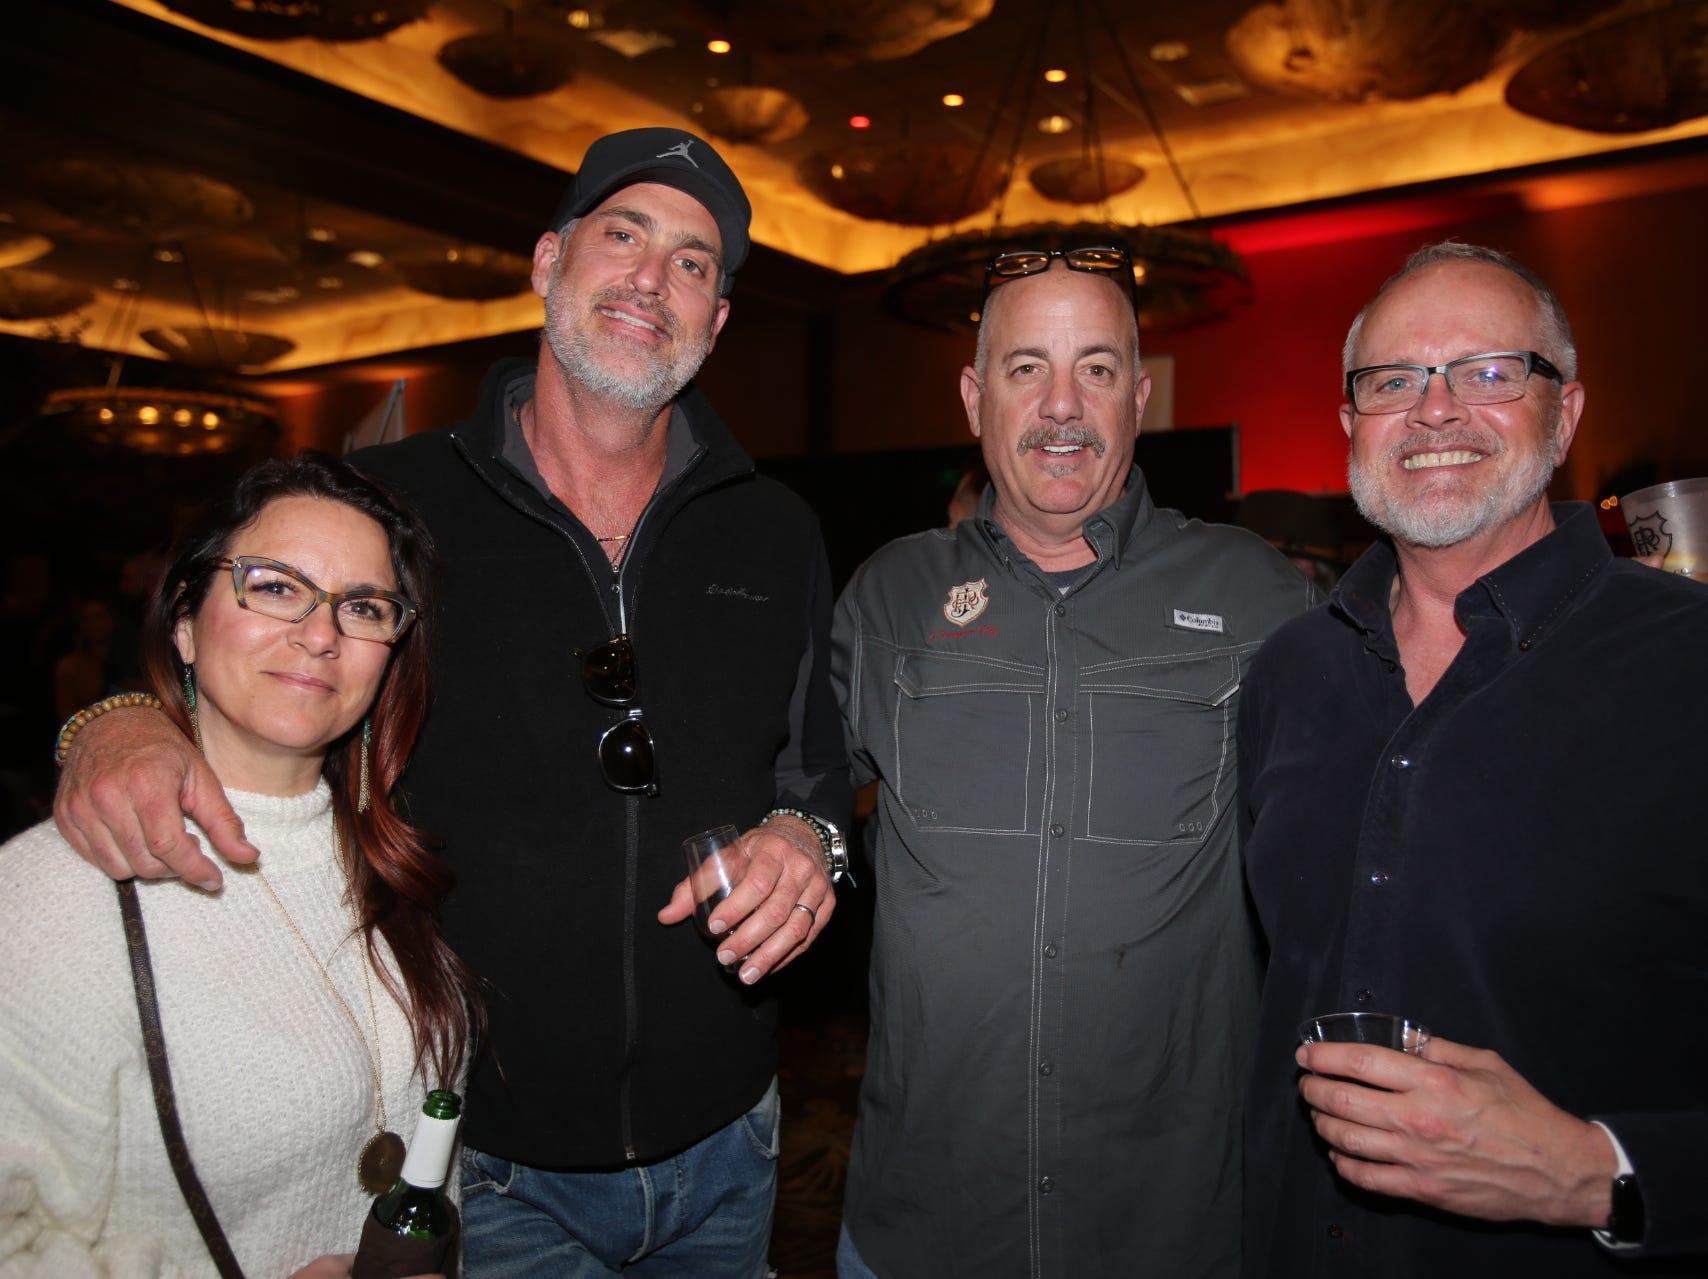 Teresa and Rob Turner, Matt Miller, and Pete Maxwell